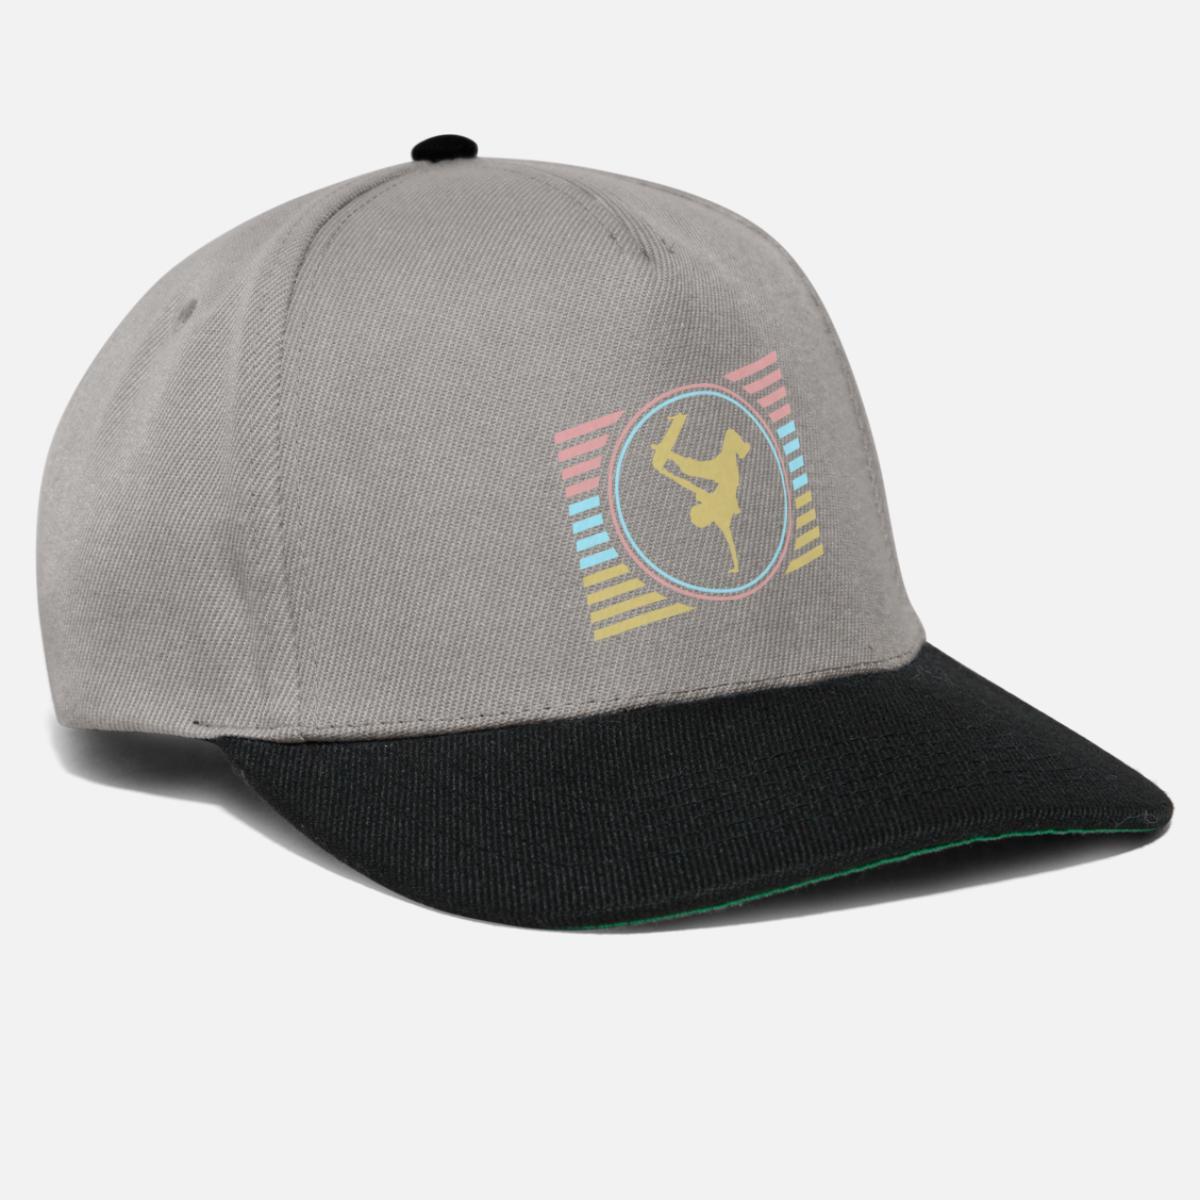 Skate Snapback Cap  548bbda5b01